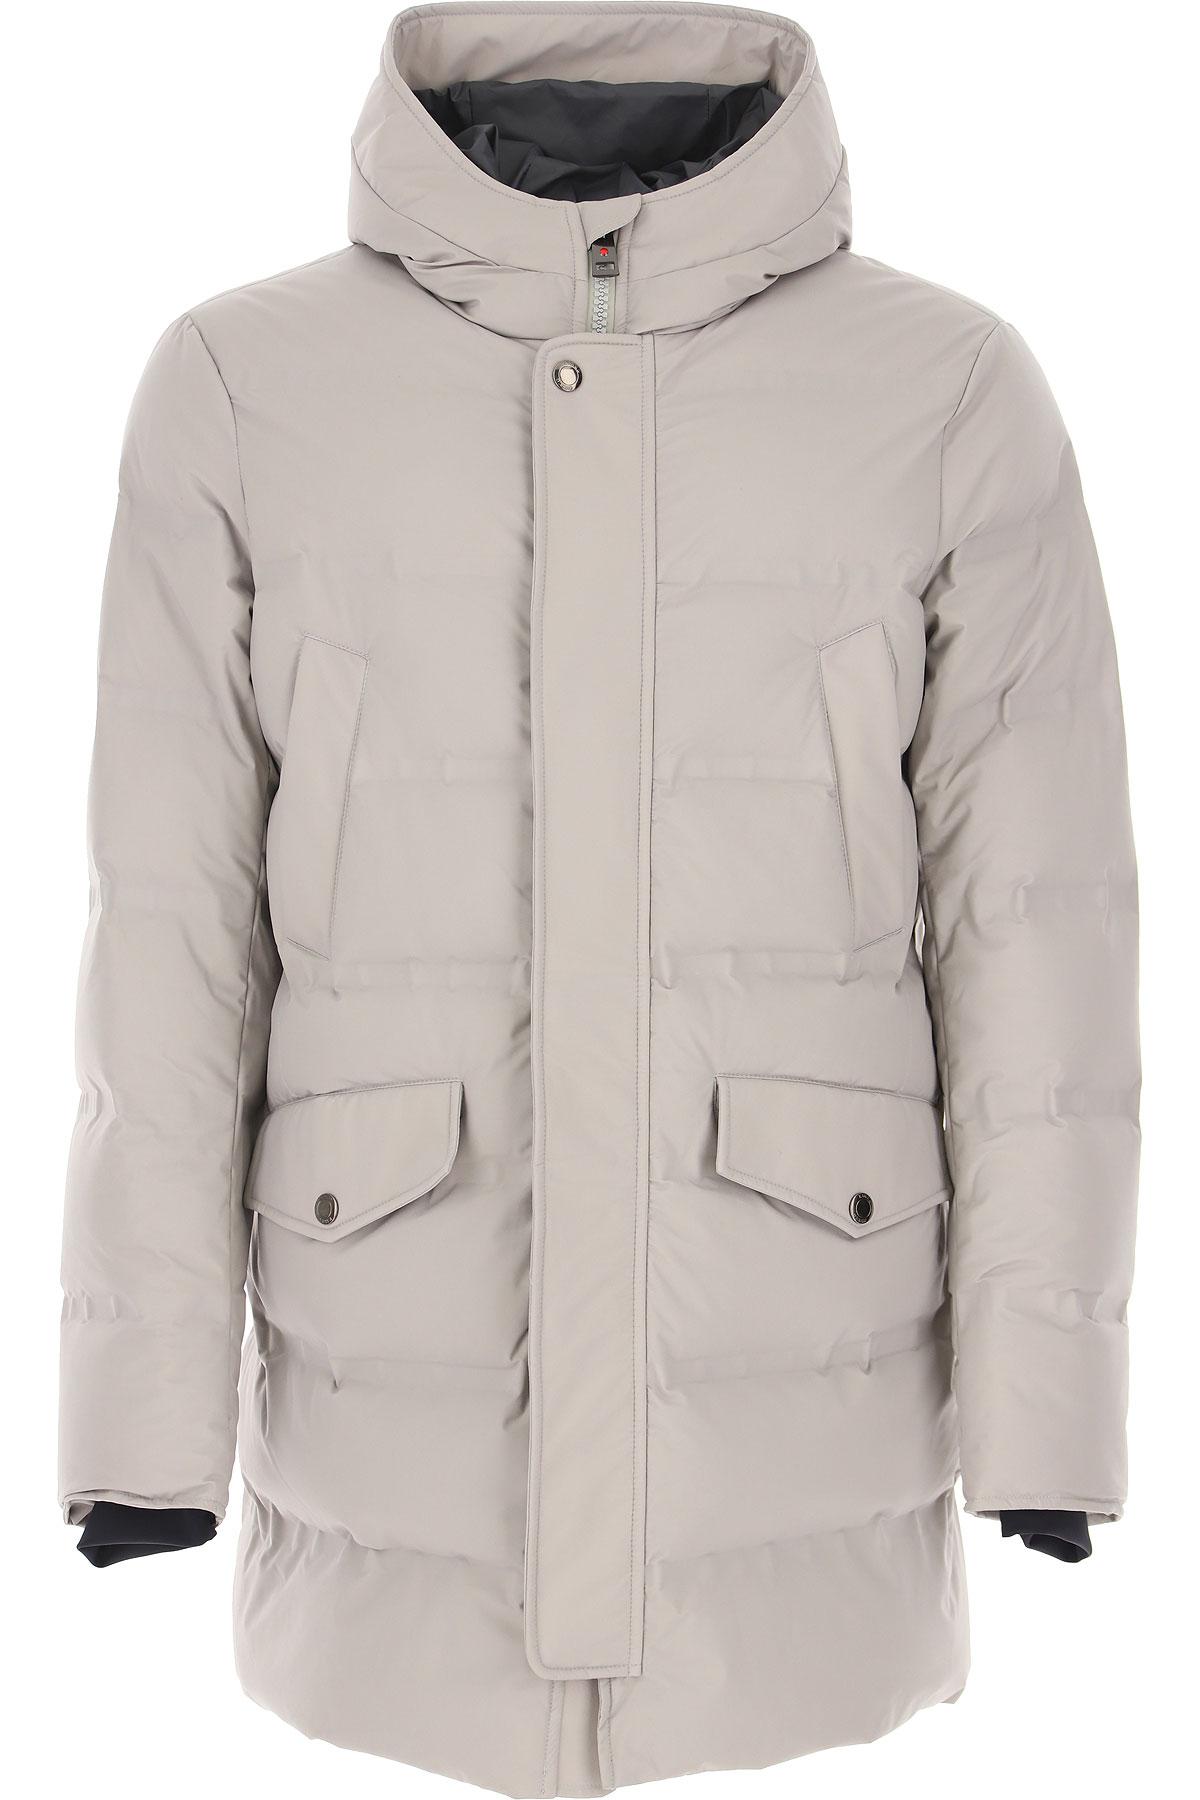 Kired Down Jacket for Men, Puffer Ski Jacket On Sale, Grey, polyamide, 2019, L M